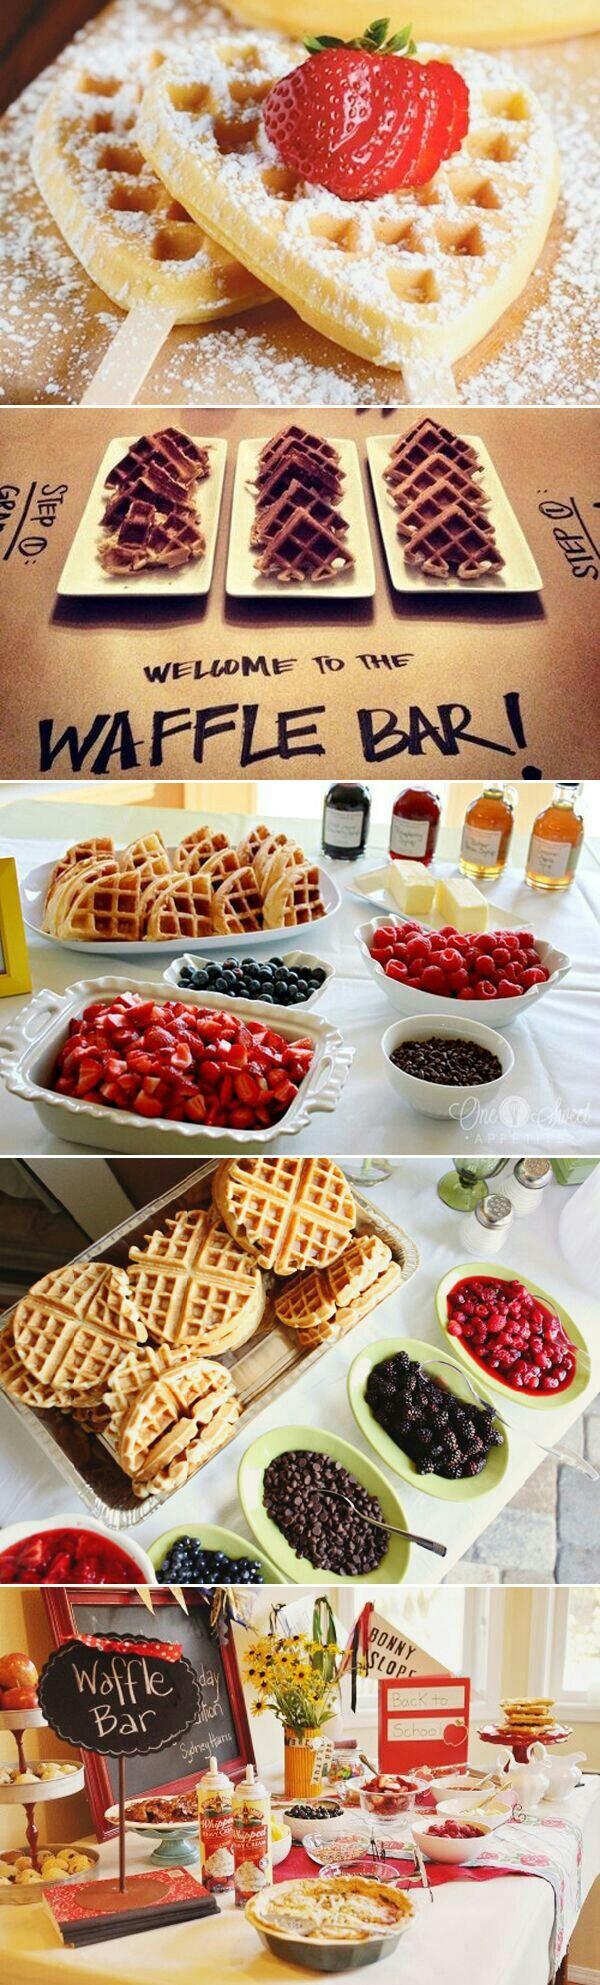 ideas for bridal shower brunch food%0A WAFFLE BAR   BREAKFAST IDEAS   IDEAS FOR BREAKFAST   BIRTHDAY PARTY FOOD  IDEAS   EASY BREAKFAST PARTY IDEAS   WAFFLE BAR PARTY   Pinterest    Breakfast